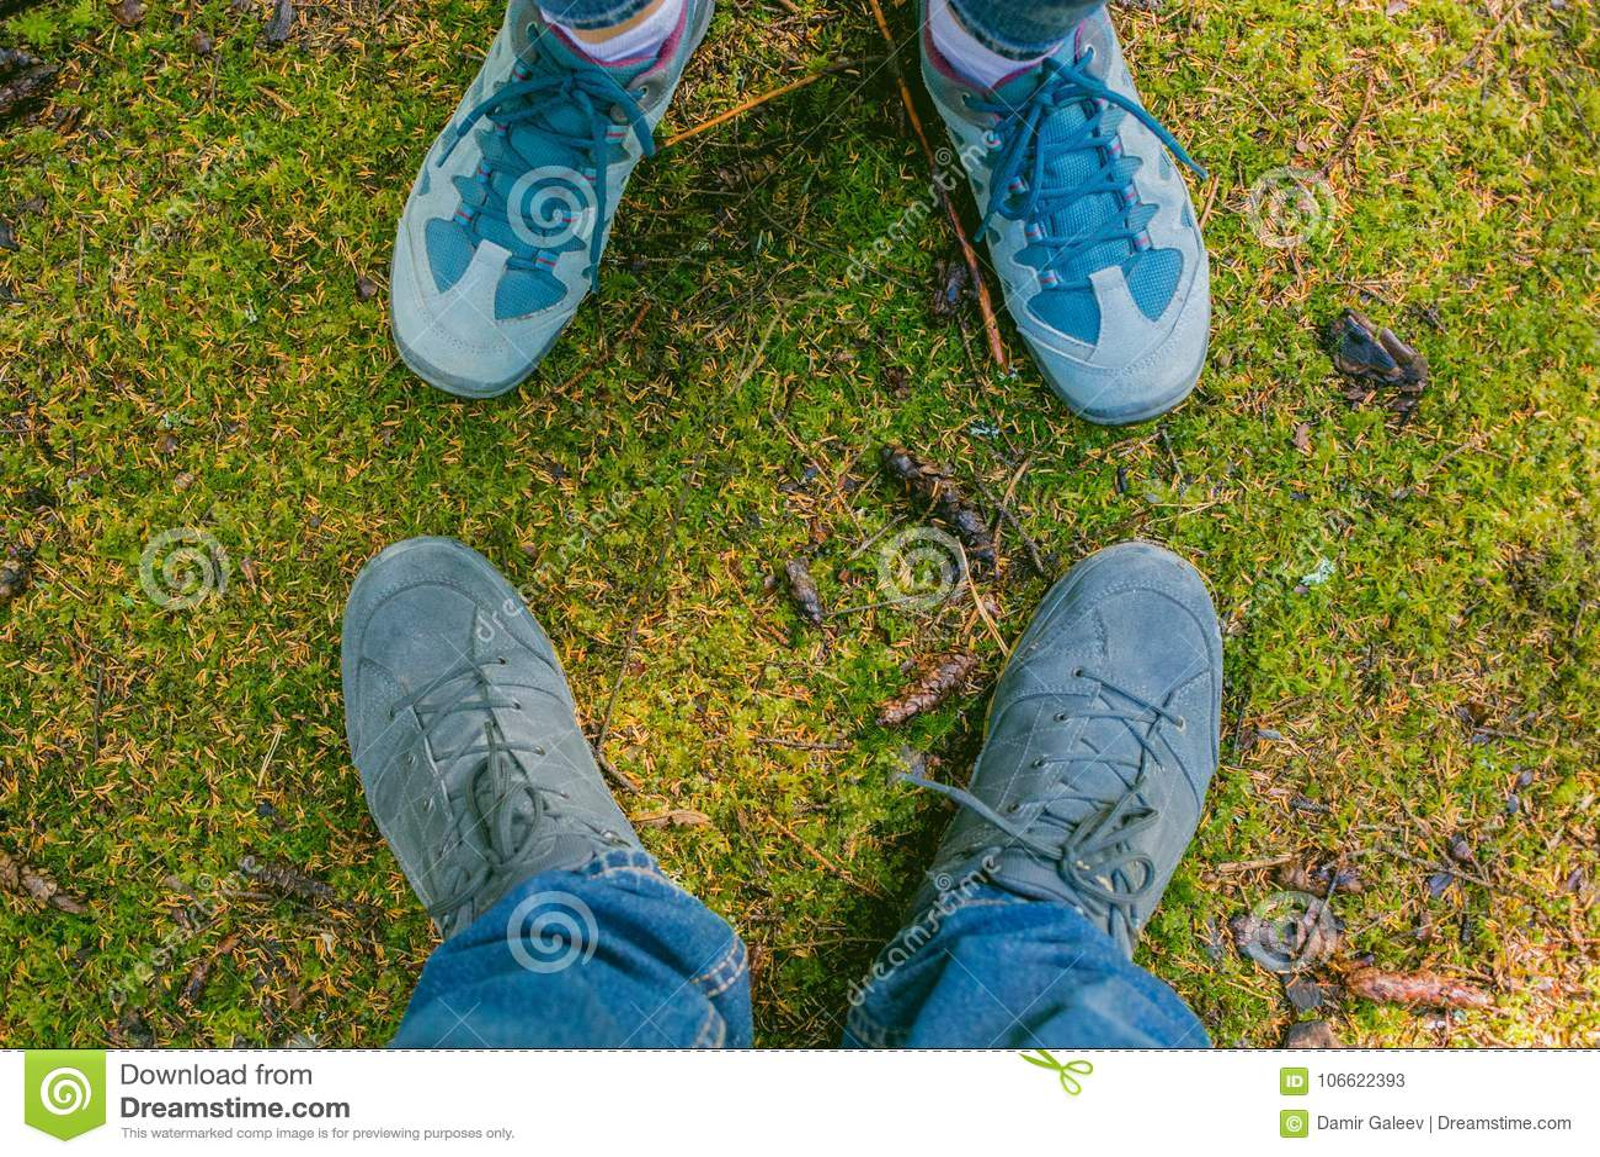 2e4f410b904 Ζευγάρι ερωτευμένου ρομαντικού υπαίθριου ποδιών ανδρών και γυναικών ...